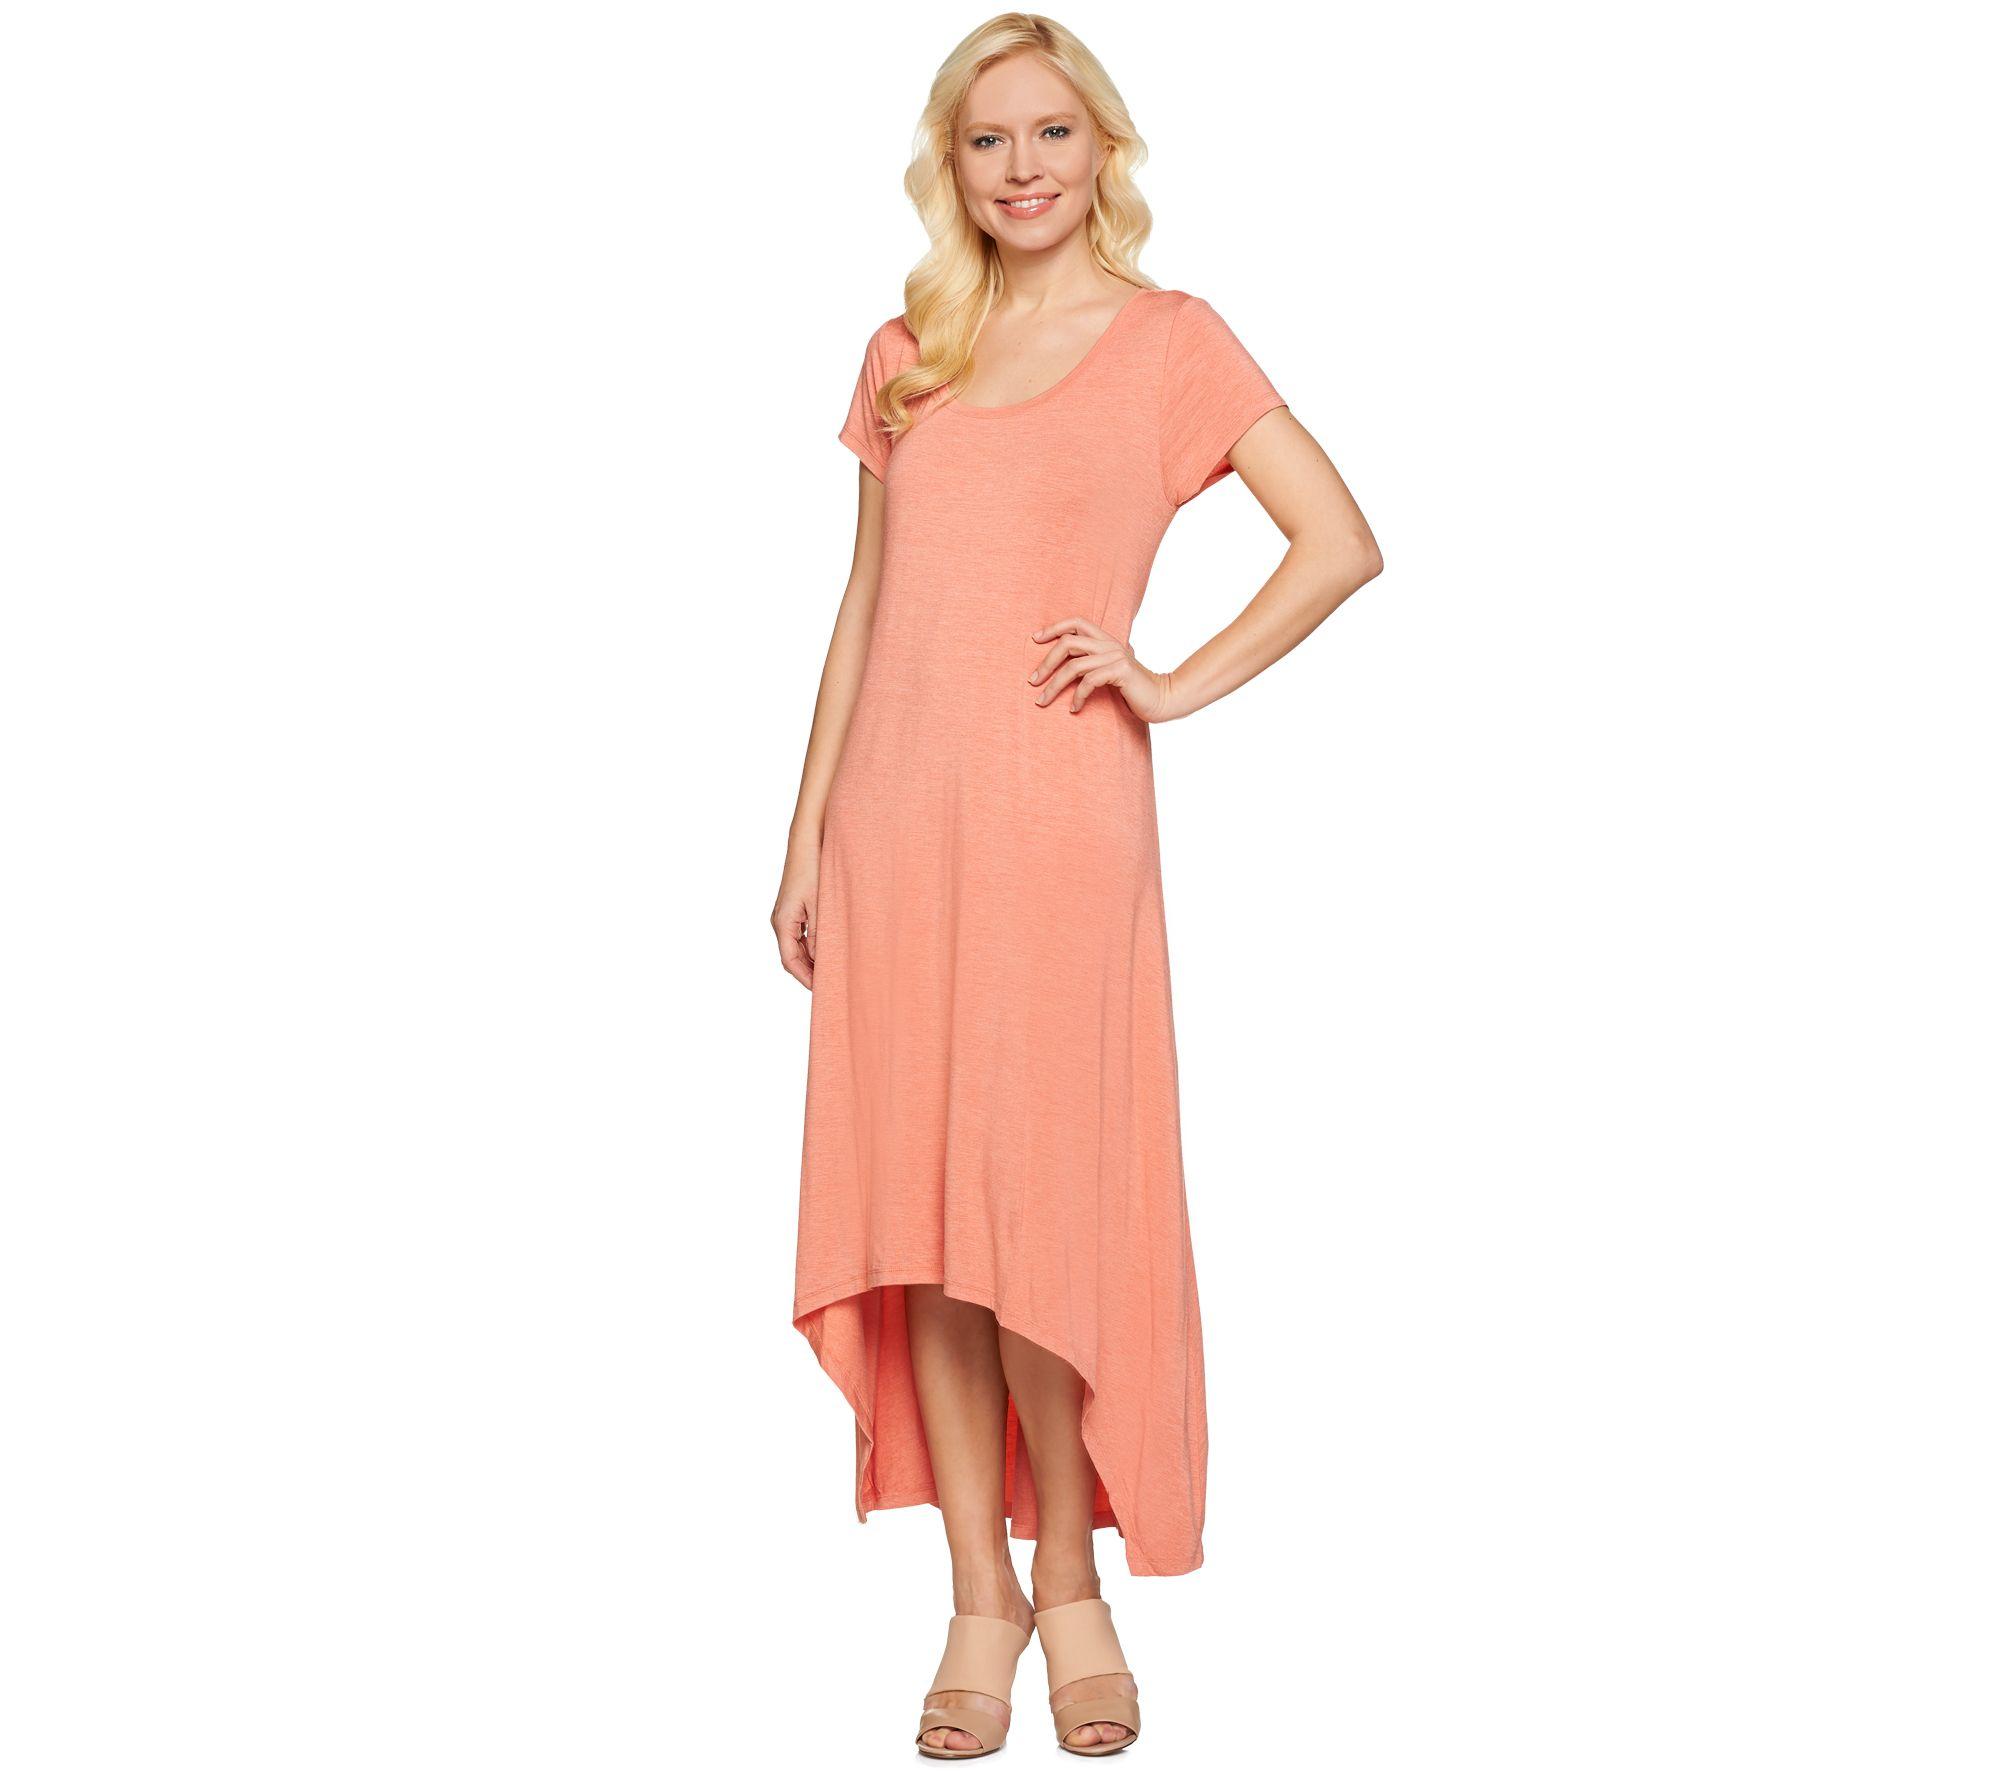 H by Halston Regular Hi-Low Hem Knit Maxi Dress - Page 1 — QVC.com